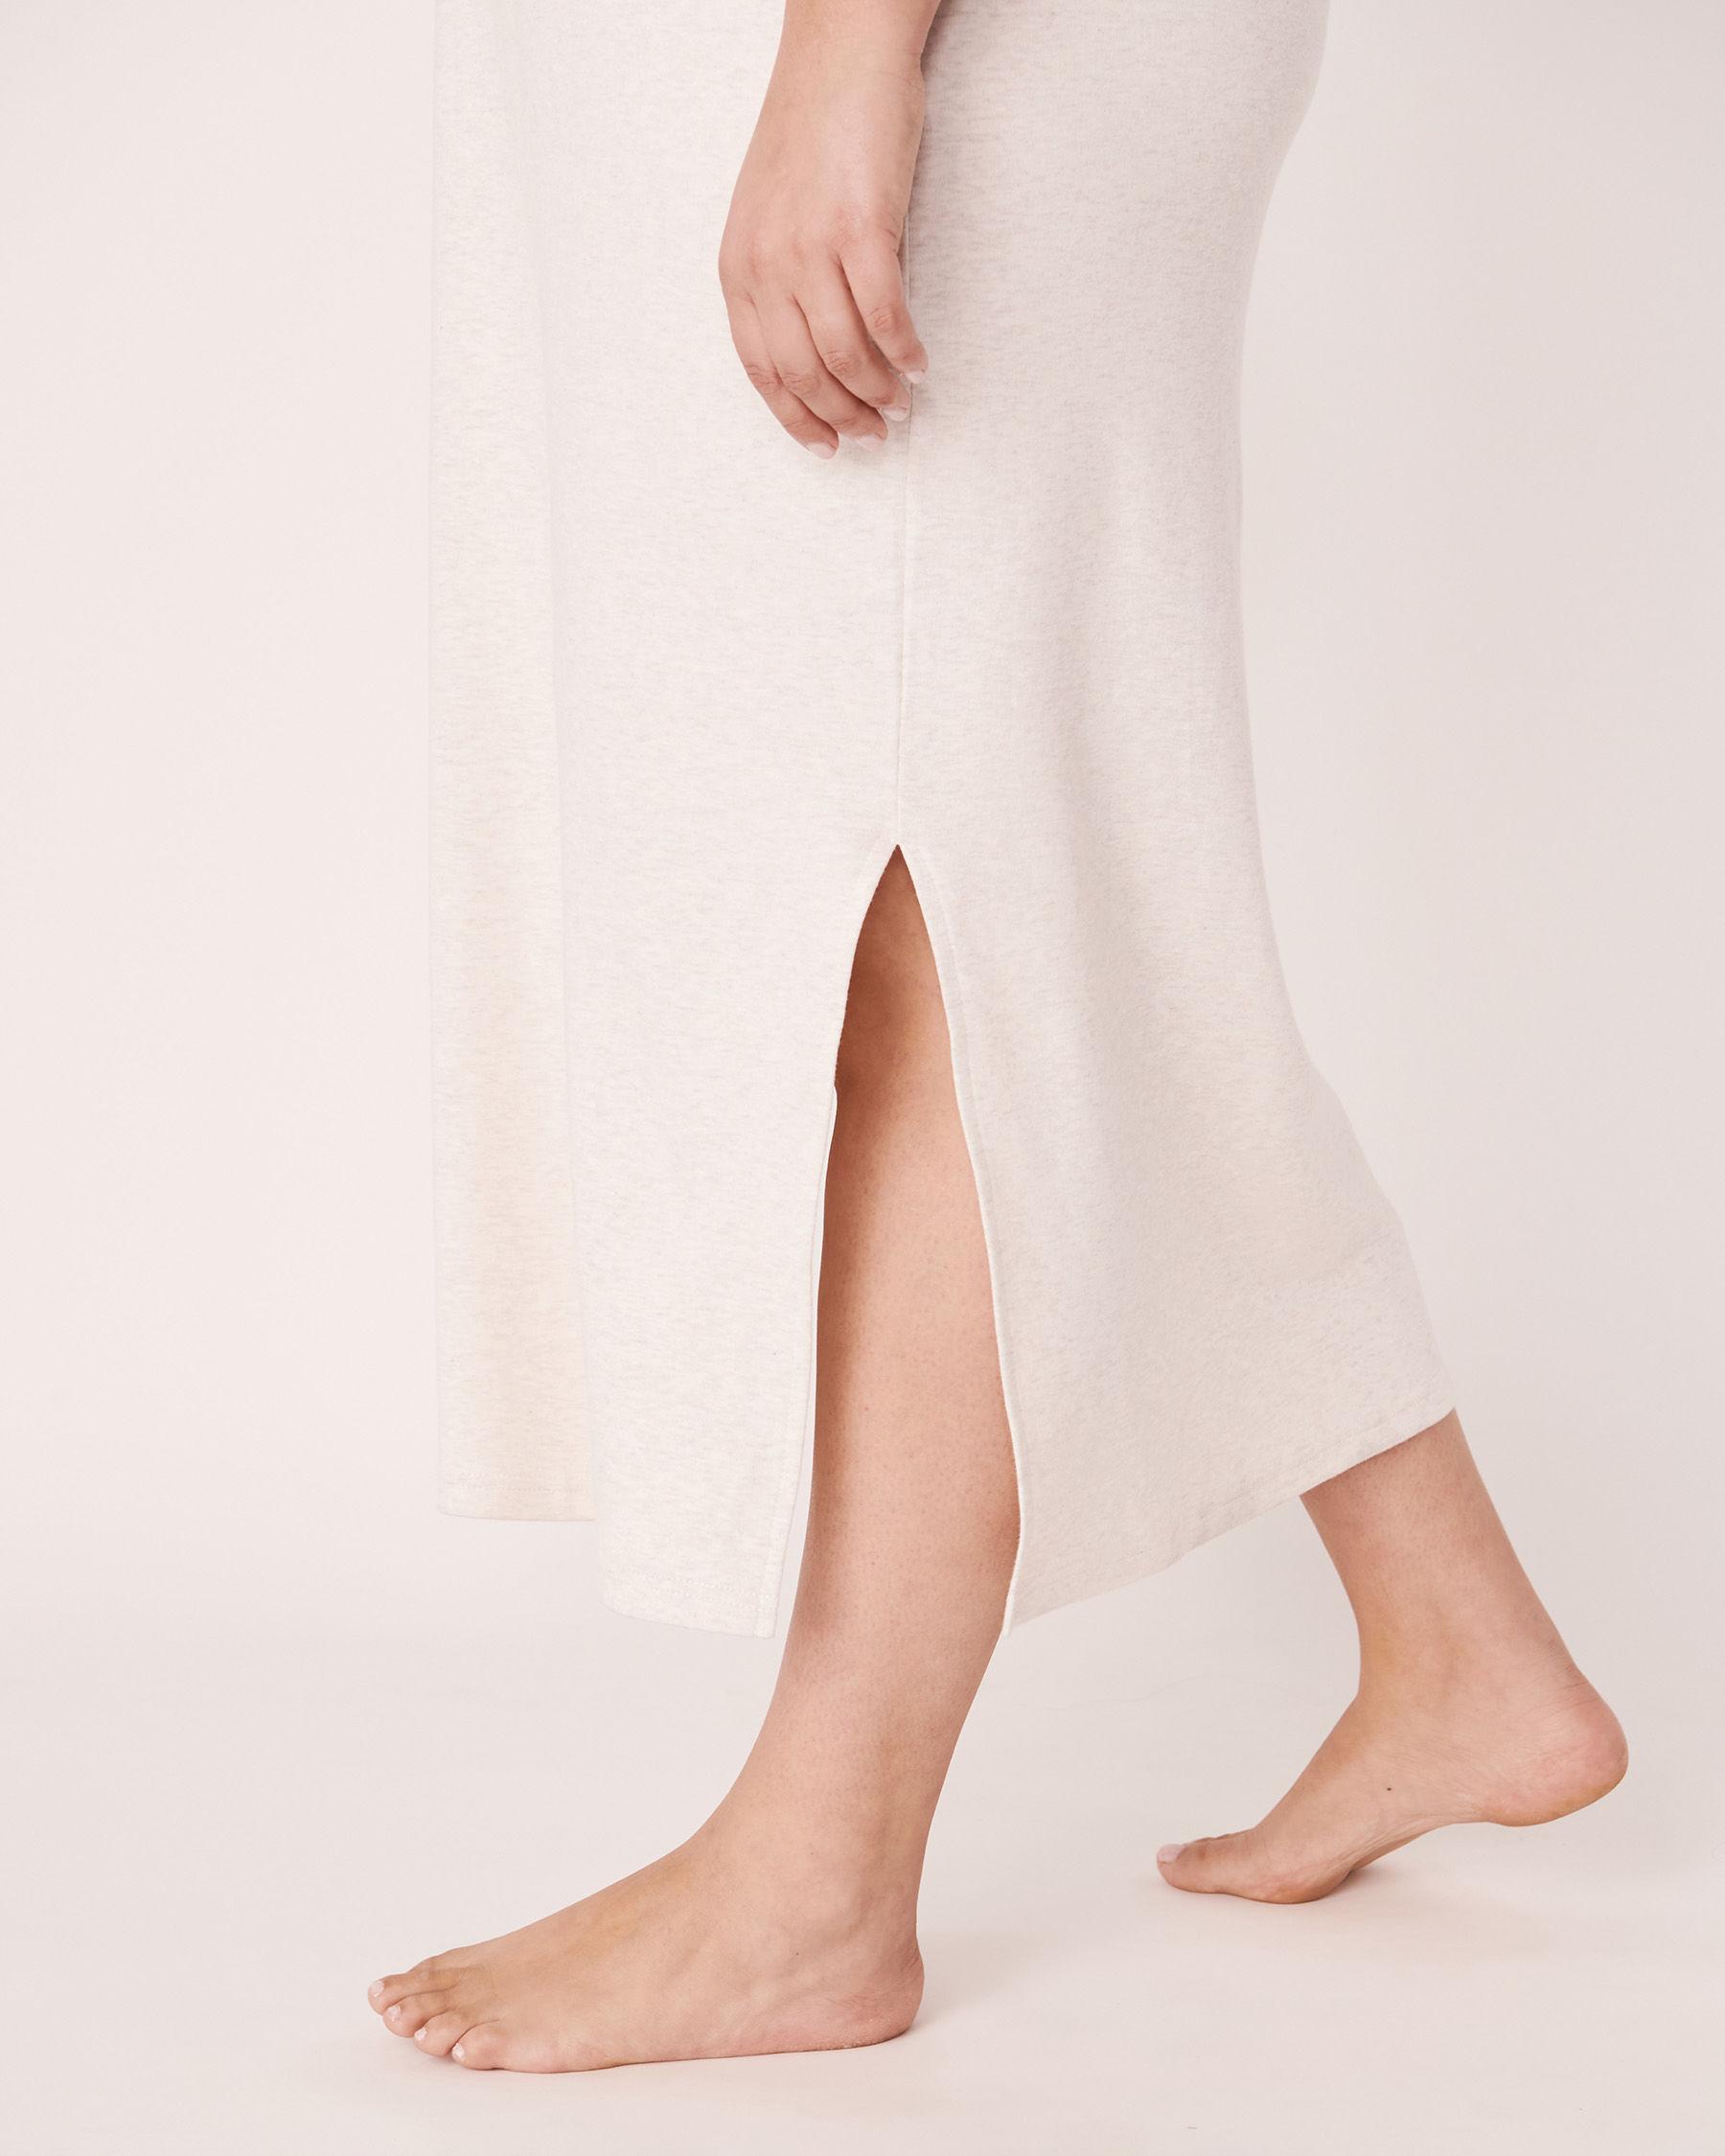 LA VIE EN ROSE Organic Cotton Sleeveless Long Sleepshirt Soft grey 40500002 - View6